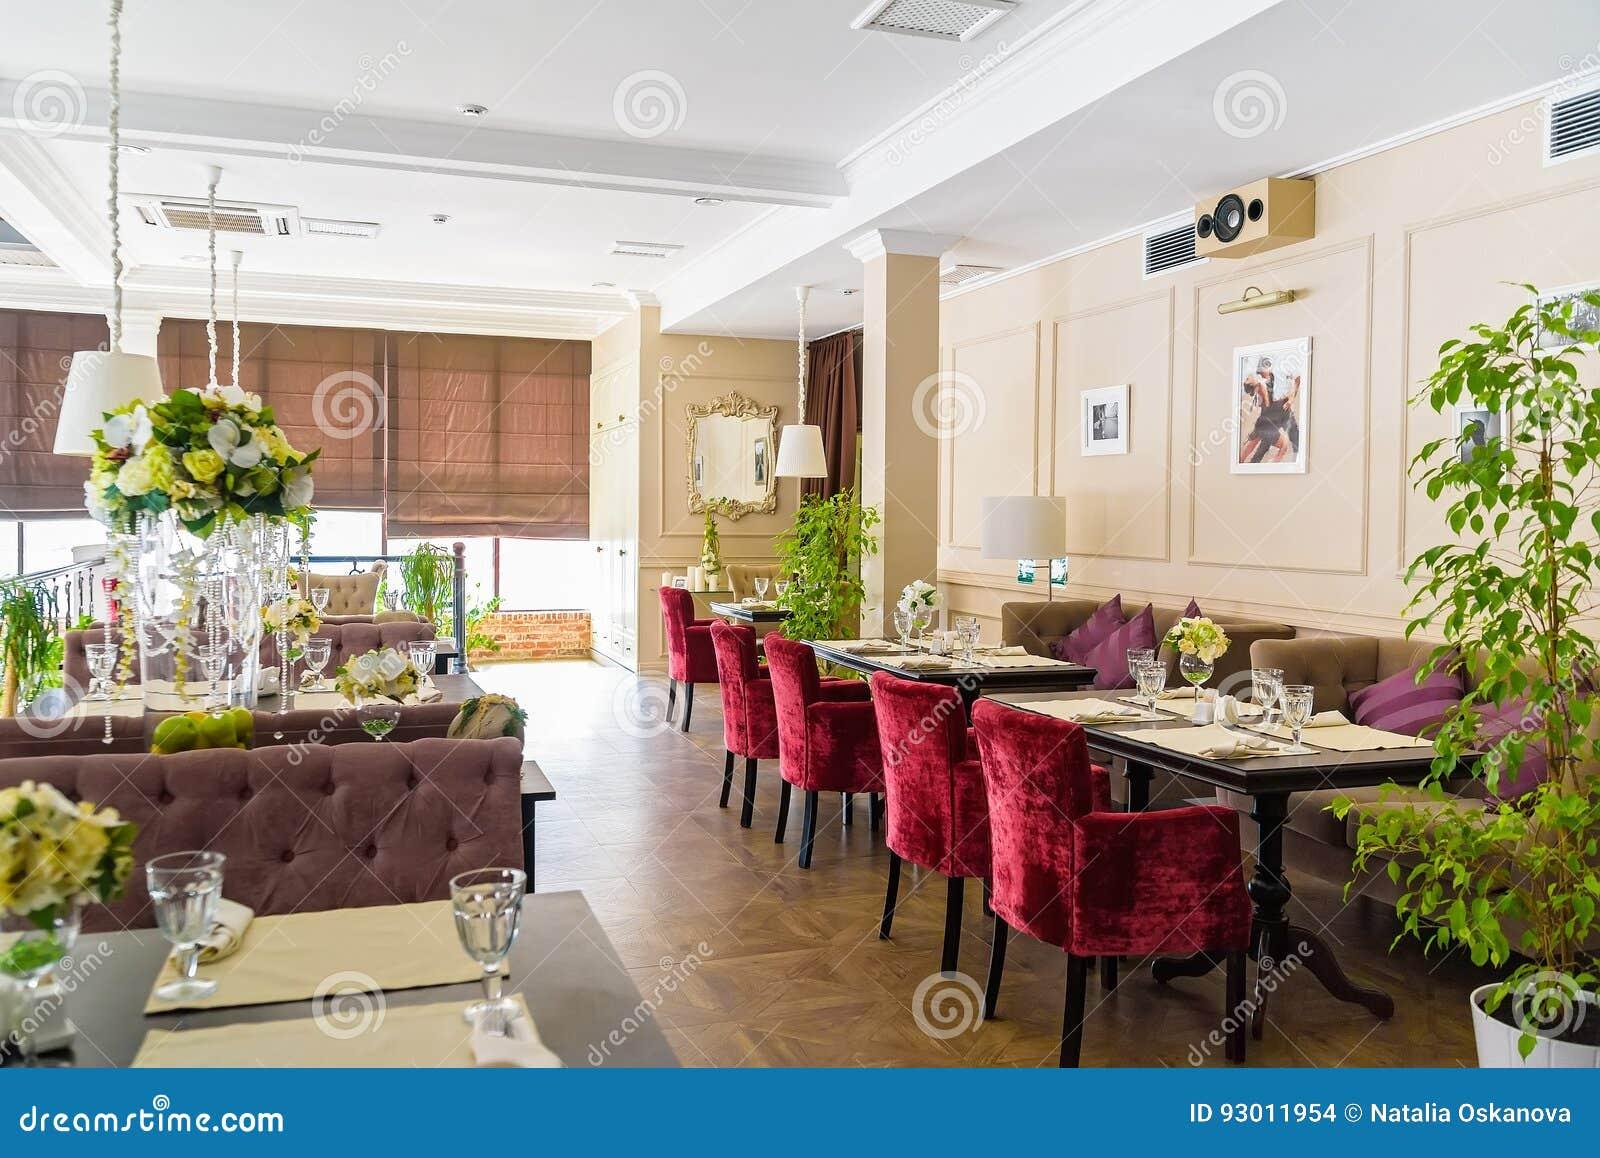 Stylish Interior Of Modern Restaurant Stock Photo - Image of ...